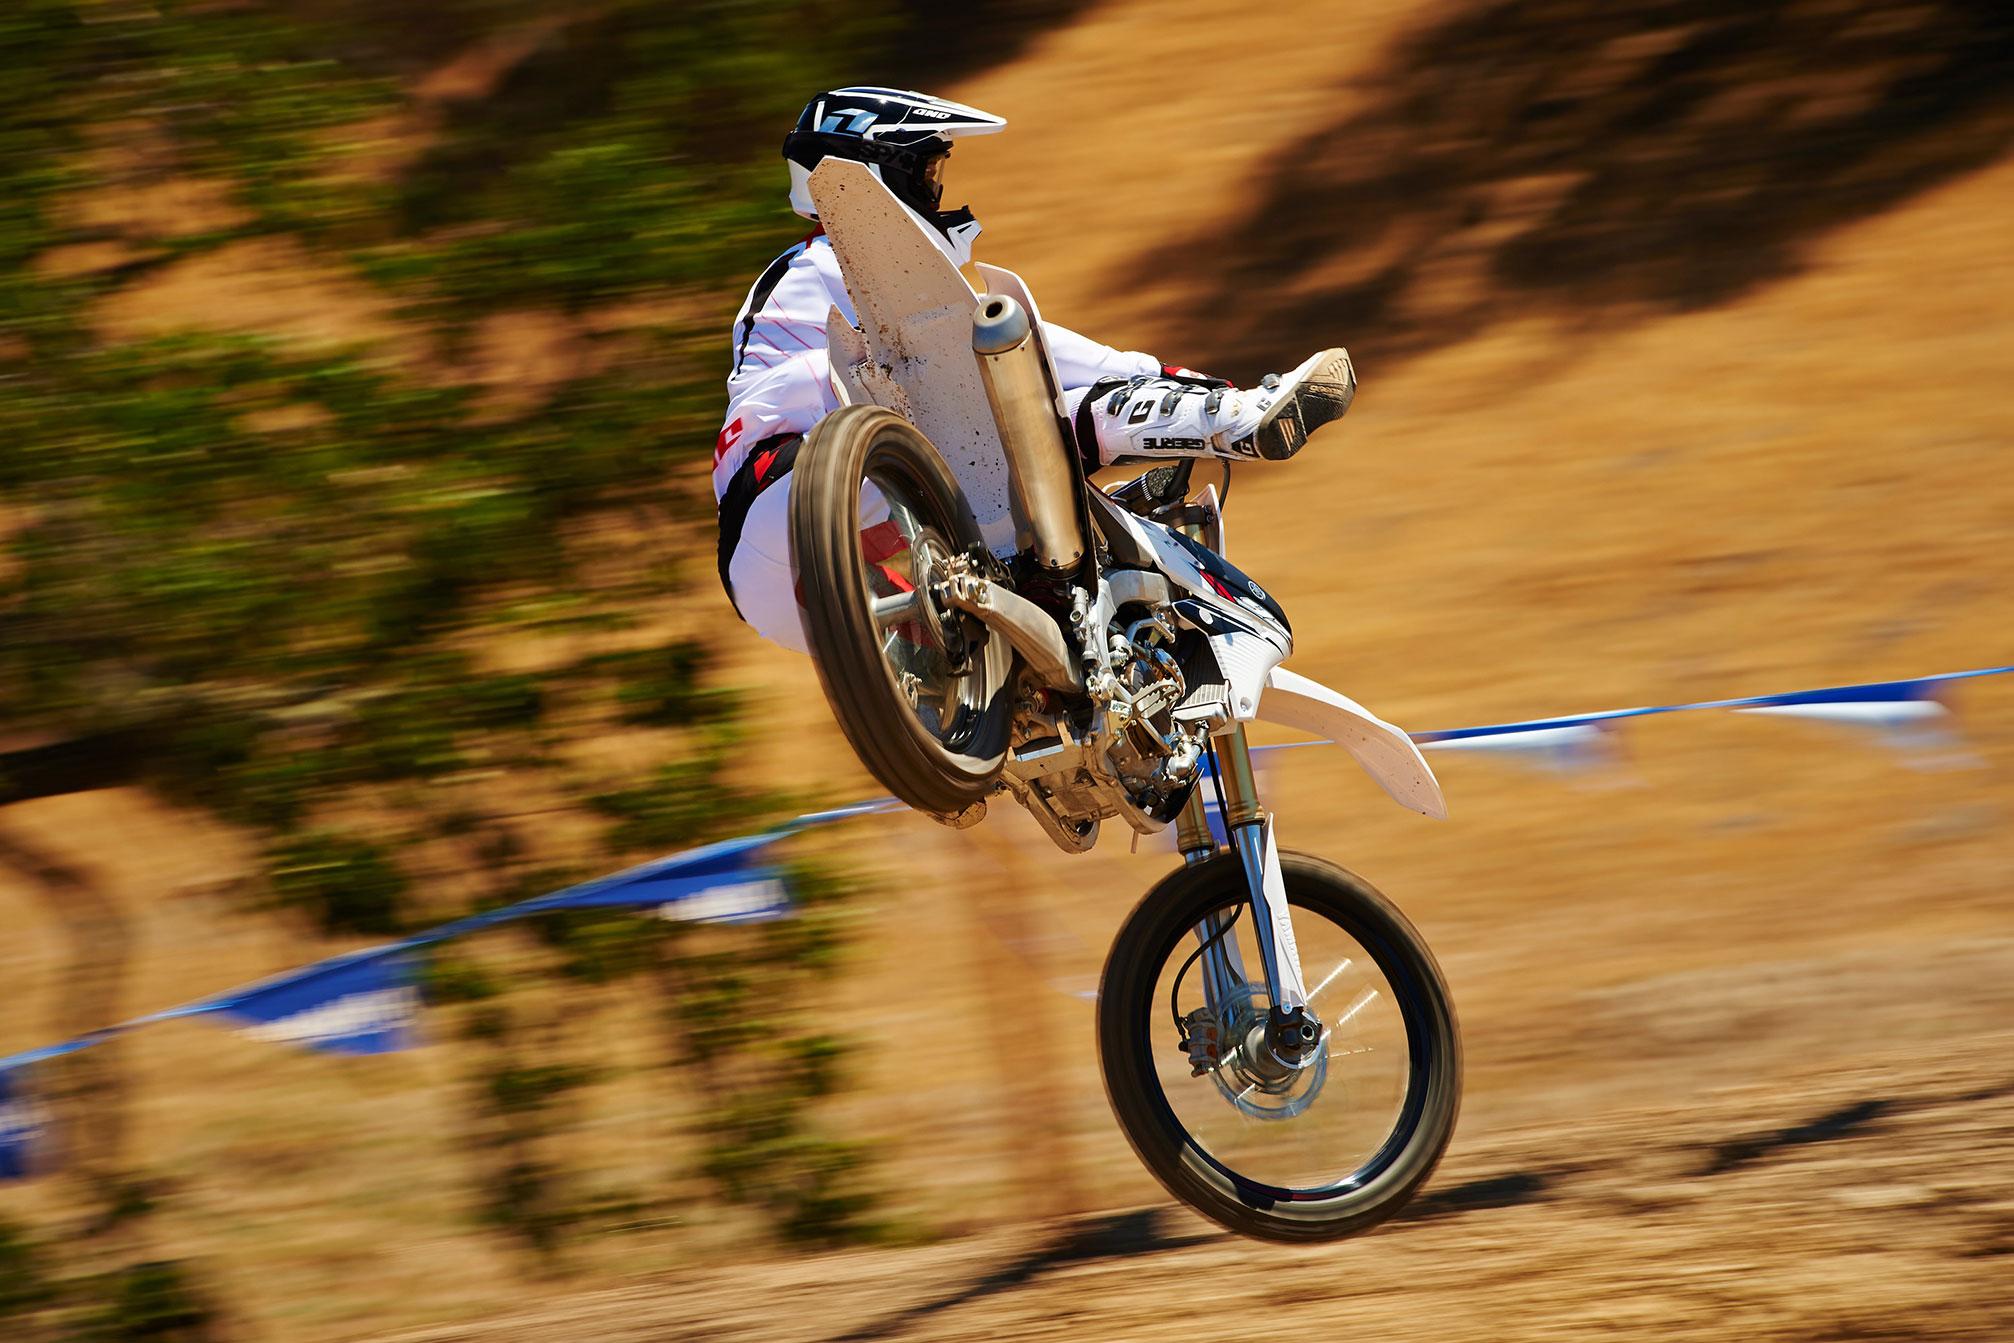 Yamaha Yz450f Dirt Motorcycle Wallpaper Hd Desktop: 2014 Yamaha YZ450F Bike Motorbike Dirtbike Race Racing D